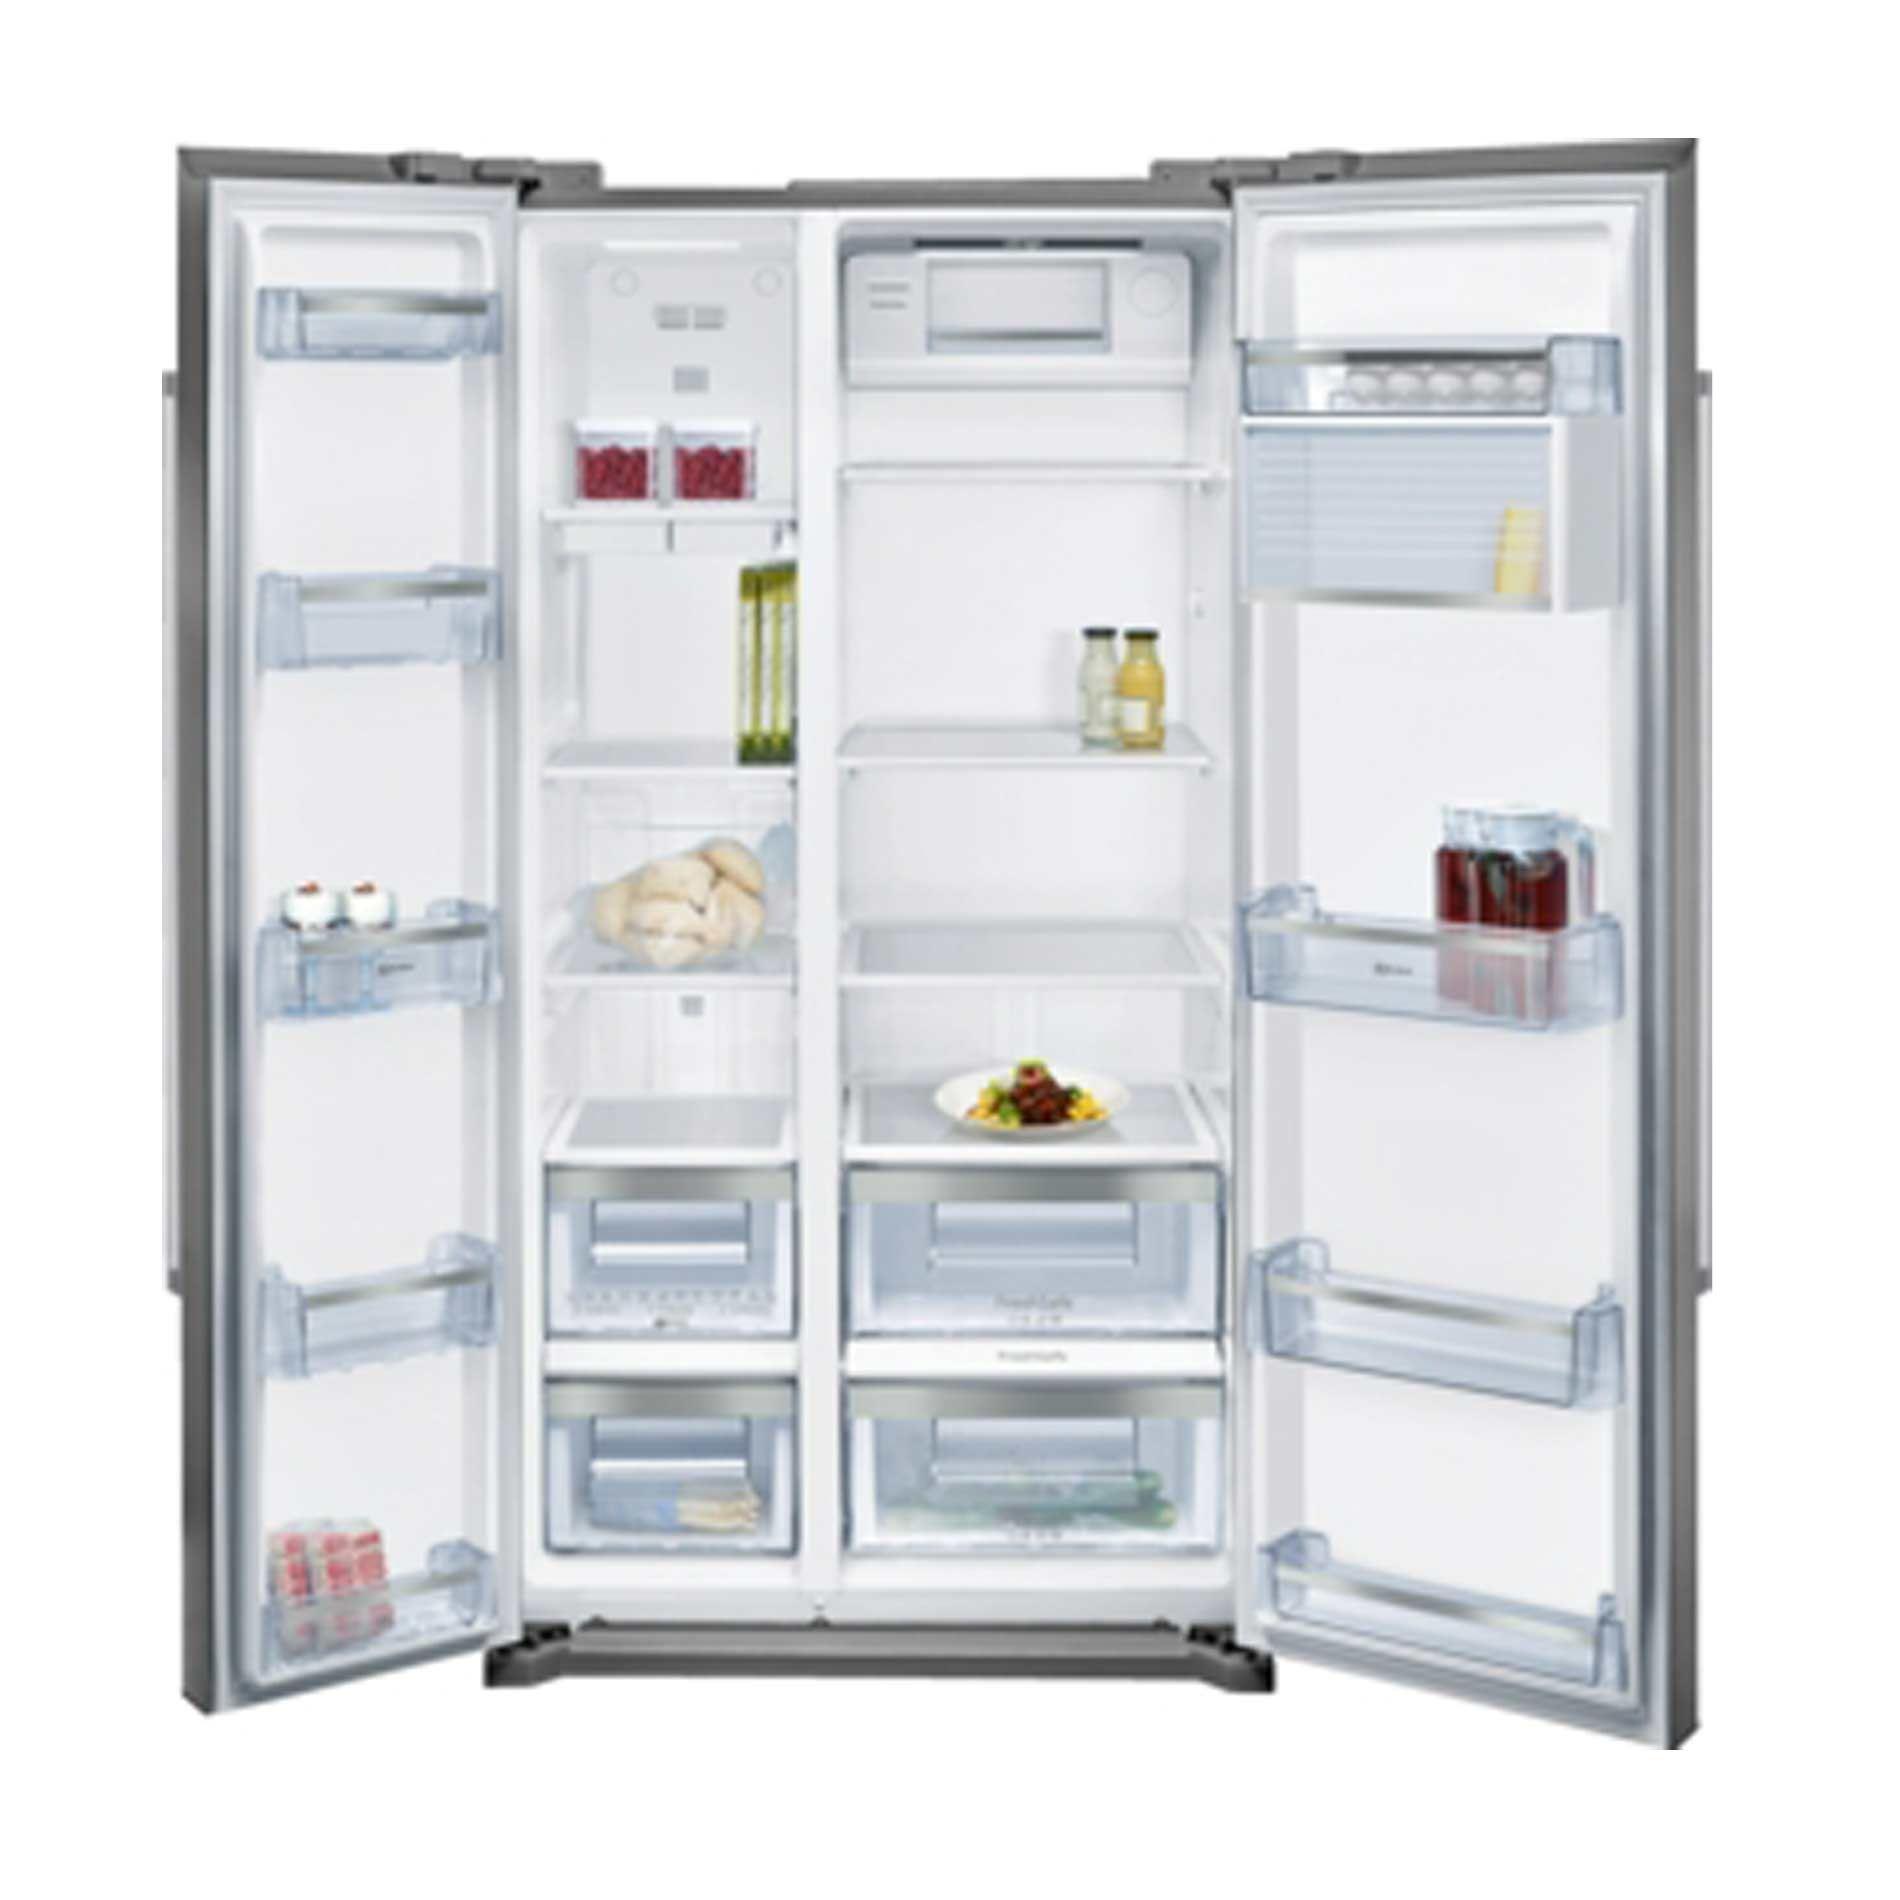 Picture of KA7902I20G American Style Fridge Freezer